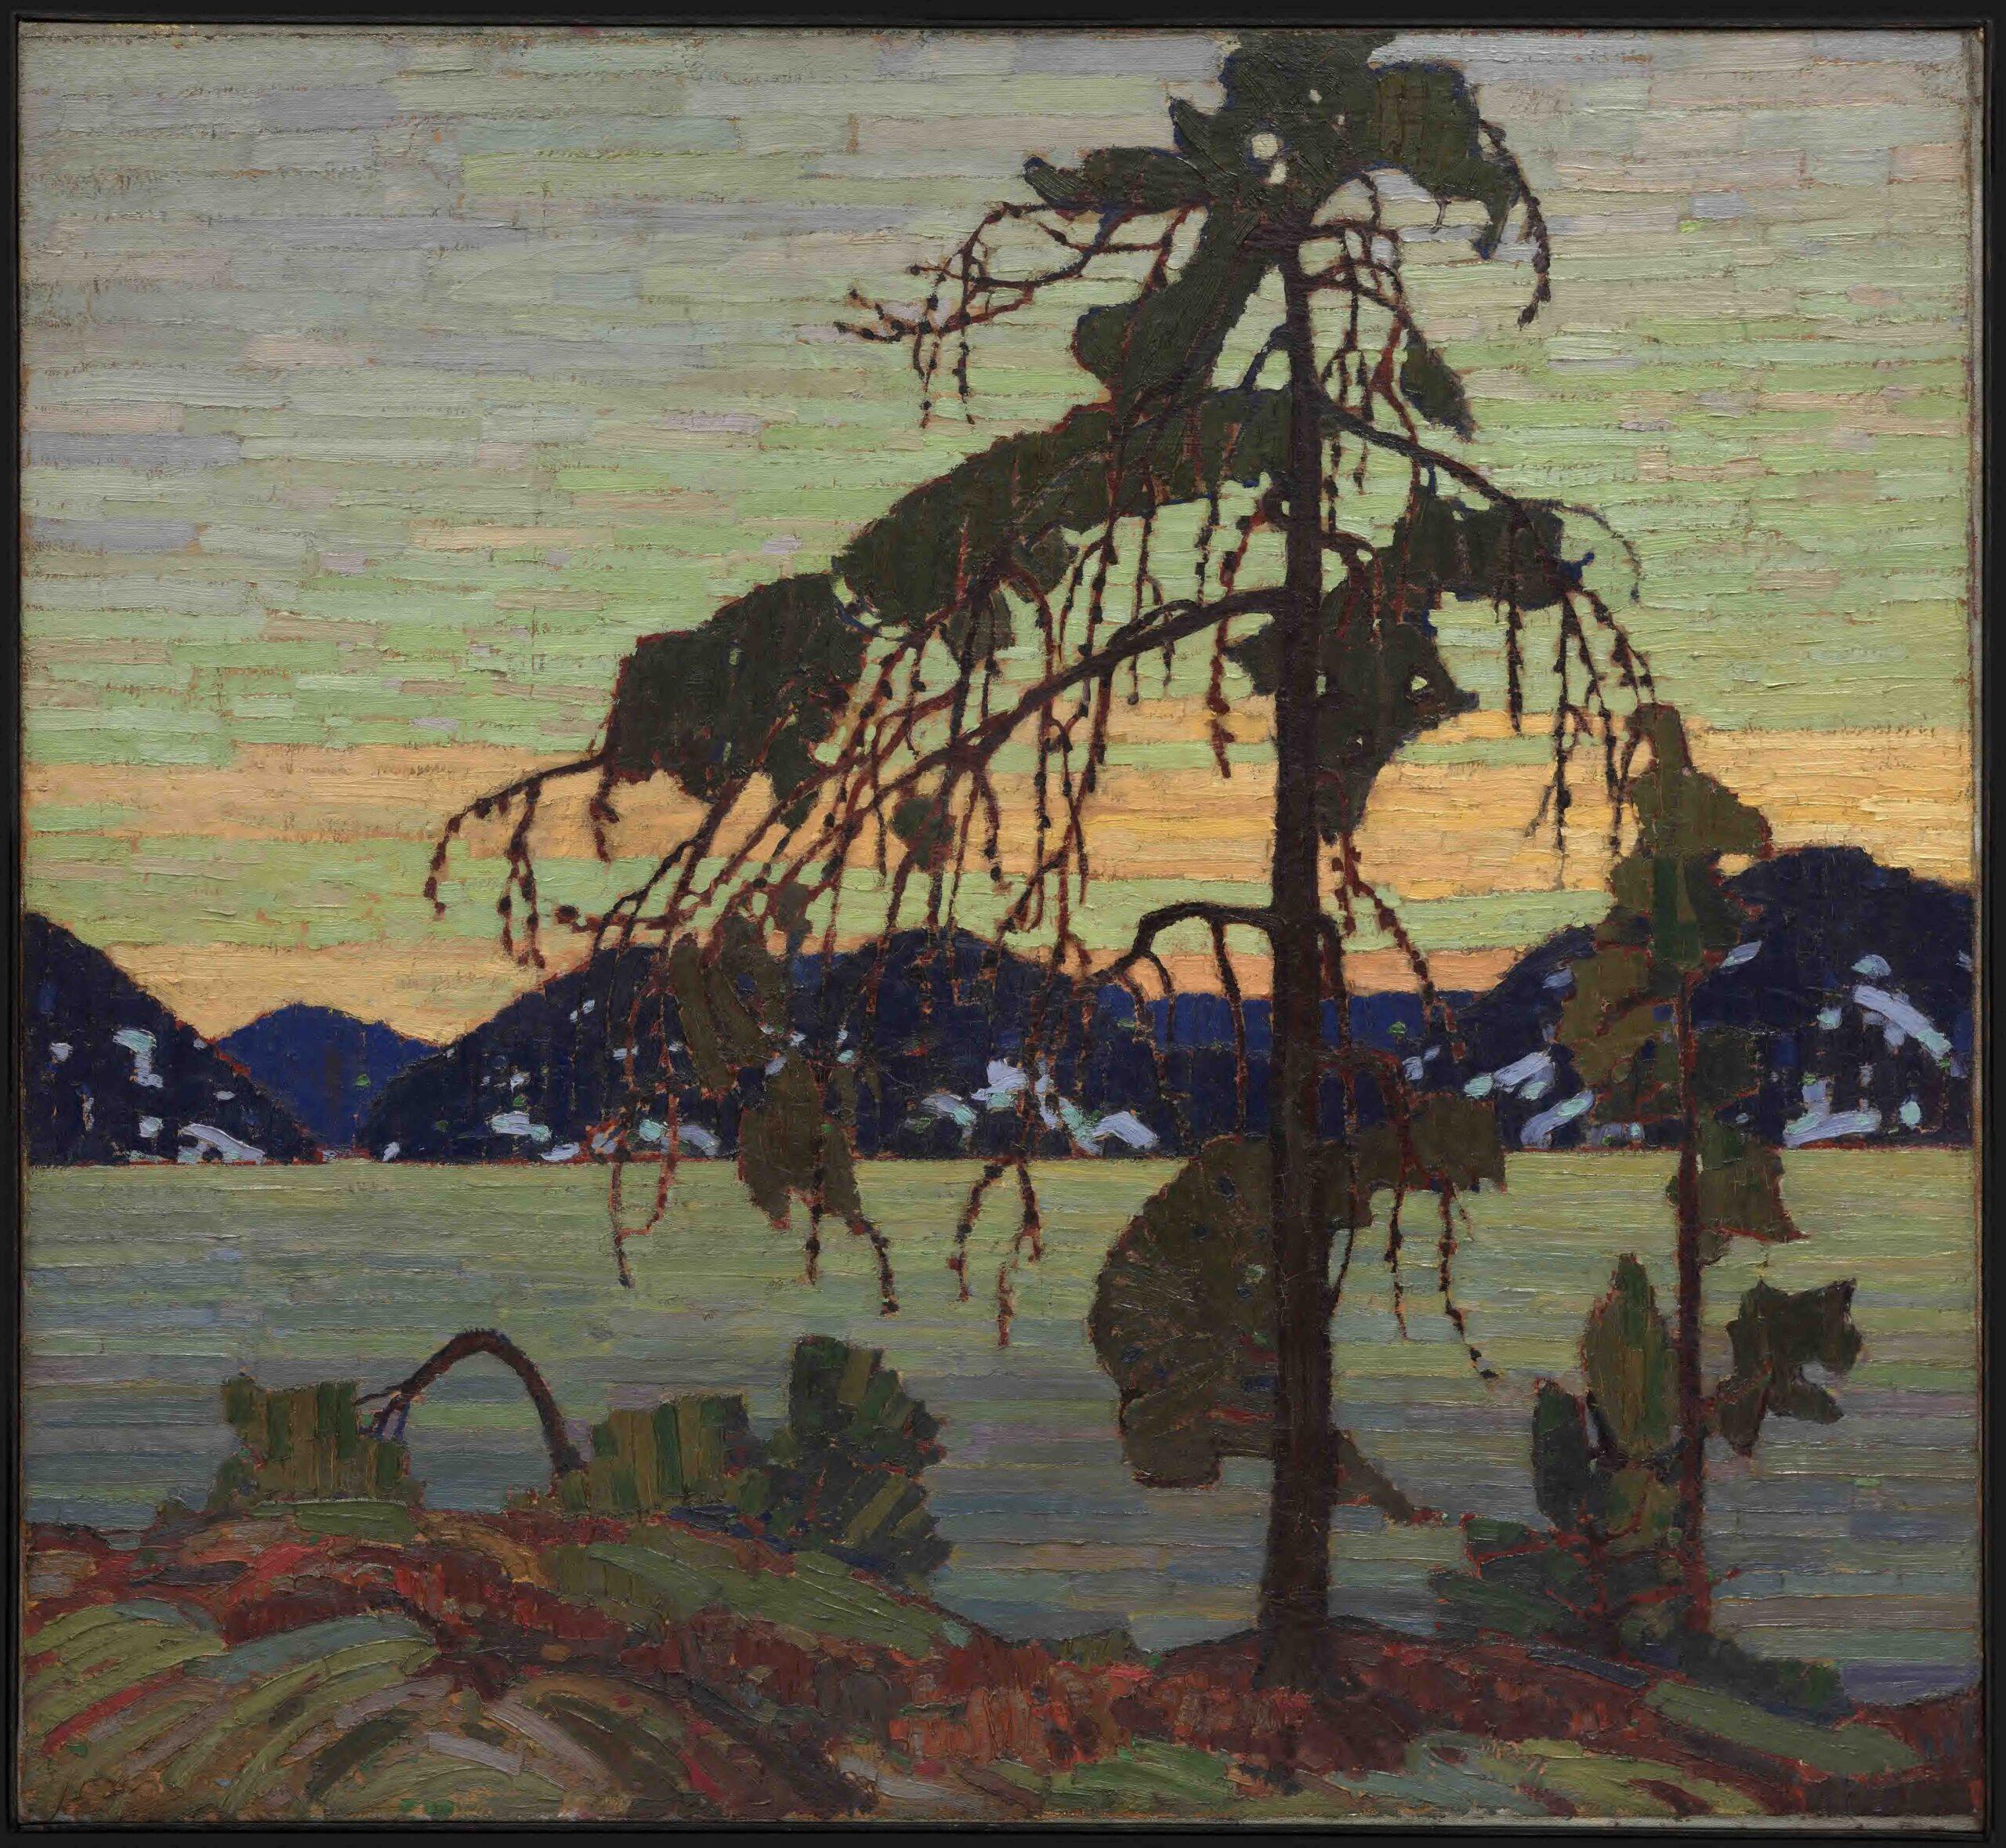 Tom Thomson's painting, The Jack Pine, 1916-1917